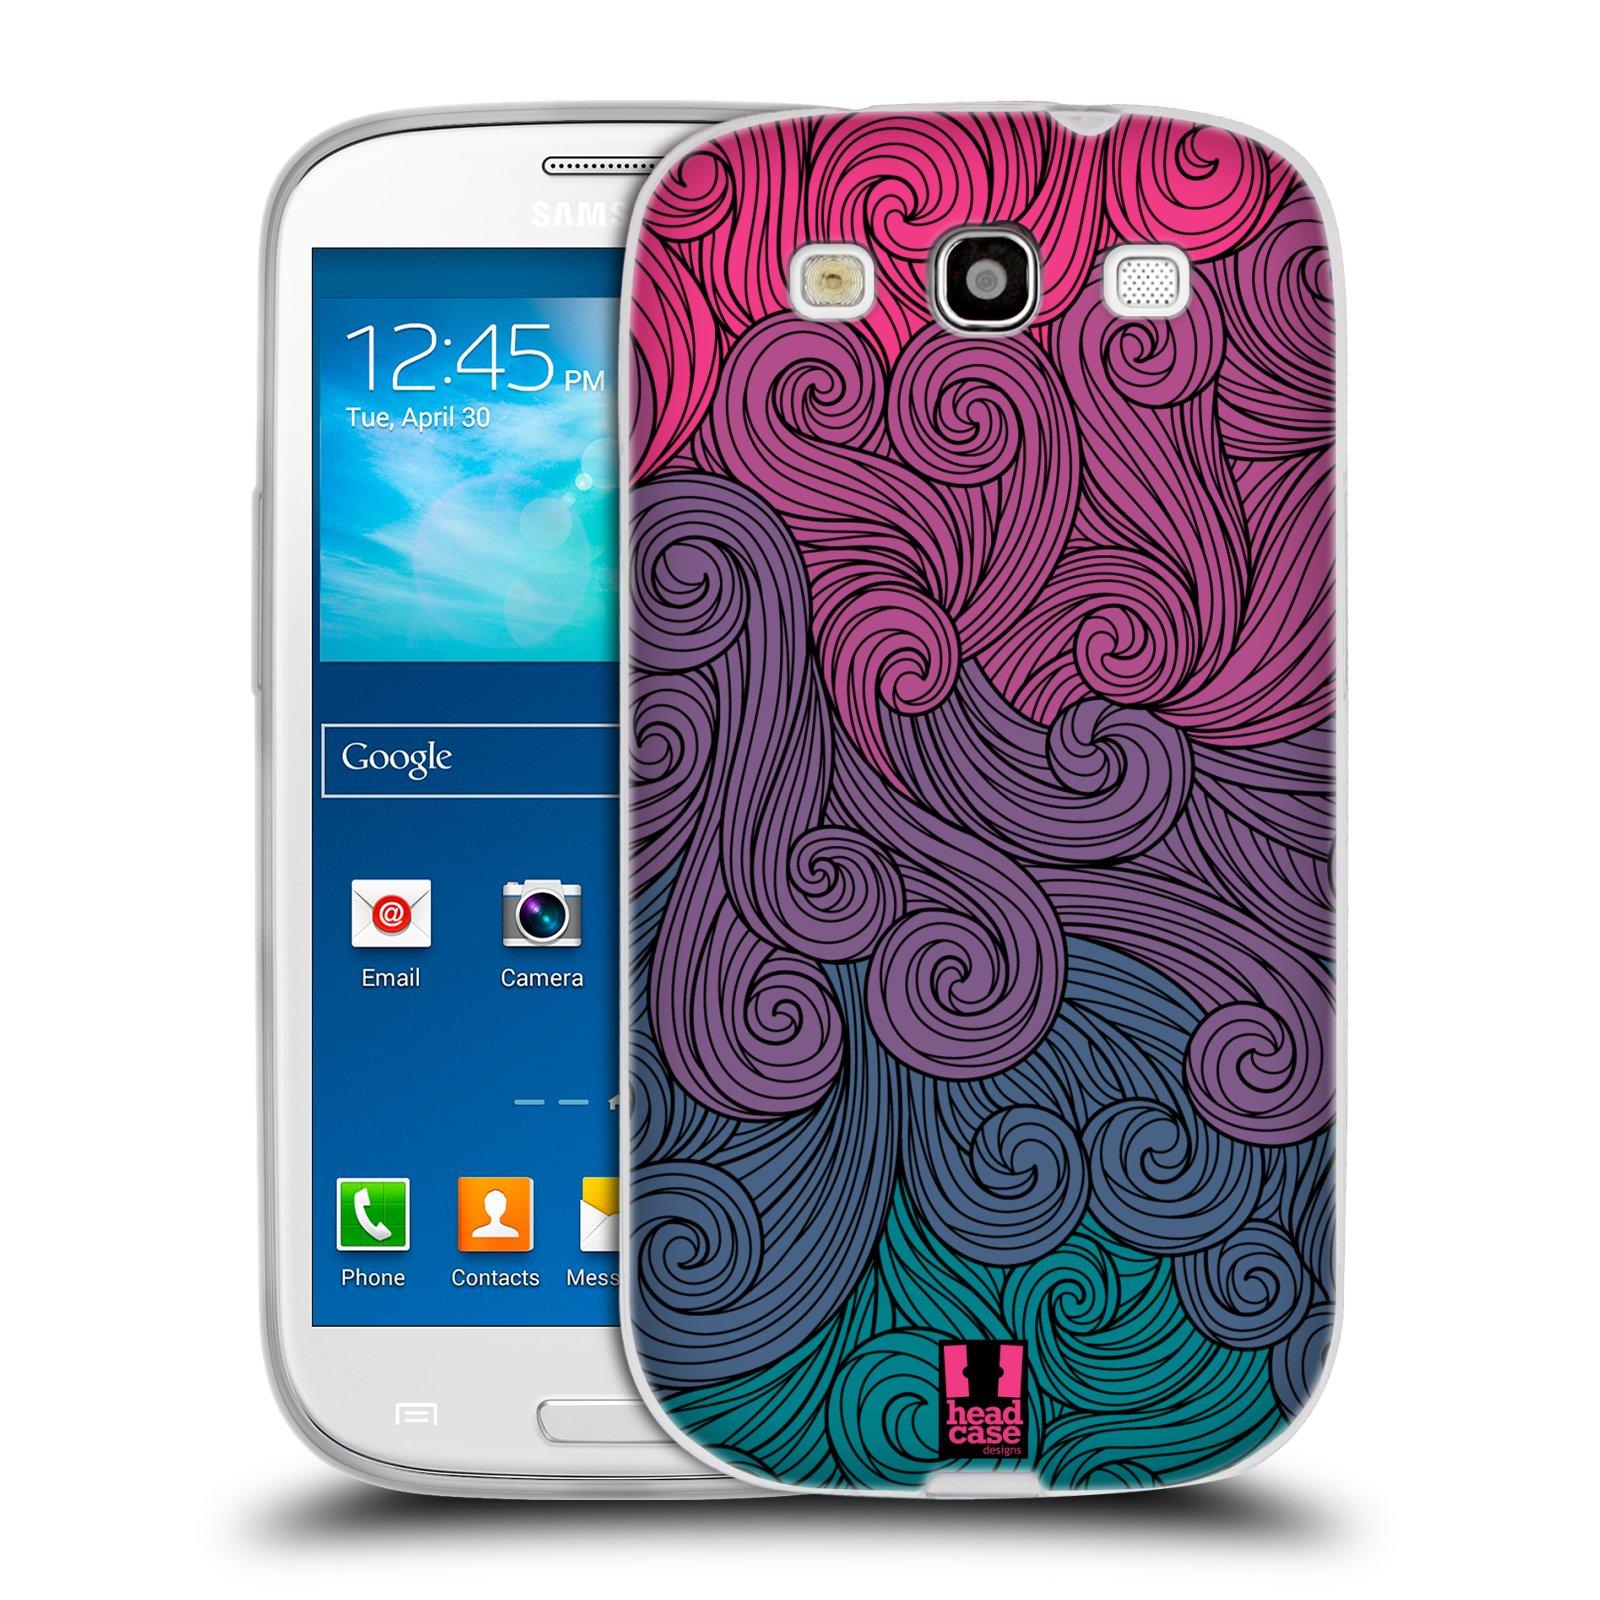 Silikonové pouzdro na mobil Samsung Galaxy S3 Neo HEAD CASE Swirls Hot Pink (Silikonový kryt či obal na mobilní telefon Samsung Galaxy S3 Neo GT-i9301i)